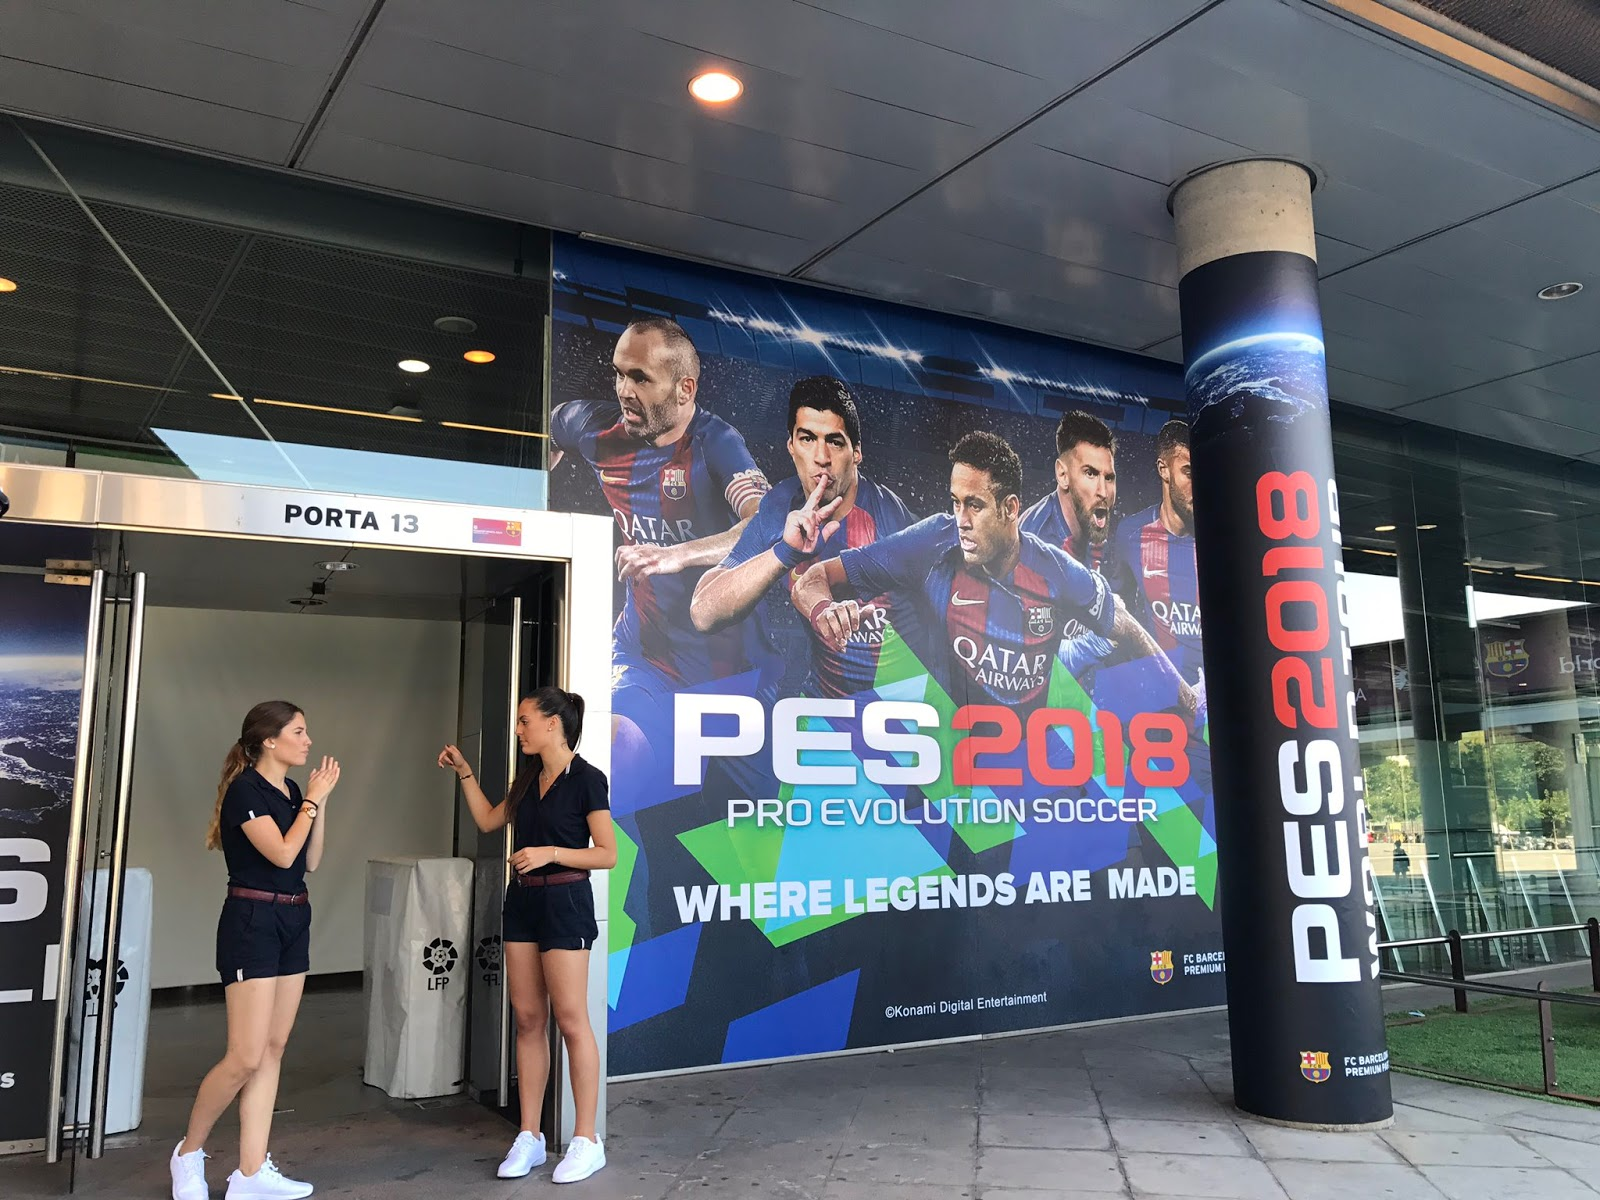 Konami Pro Evolution Soccer PES2018 World Tour #WhereLegendsAreMade [image by @officialpes]